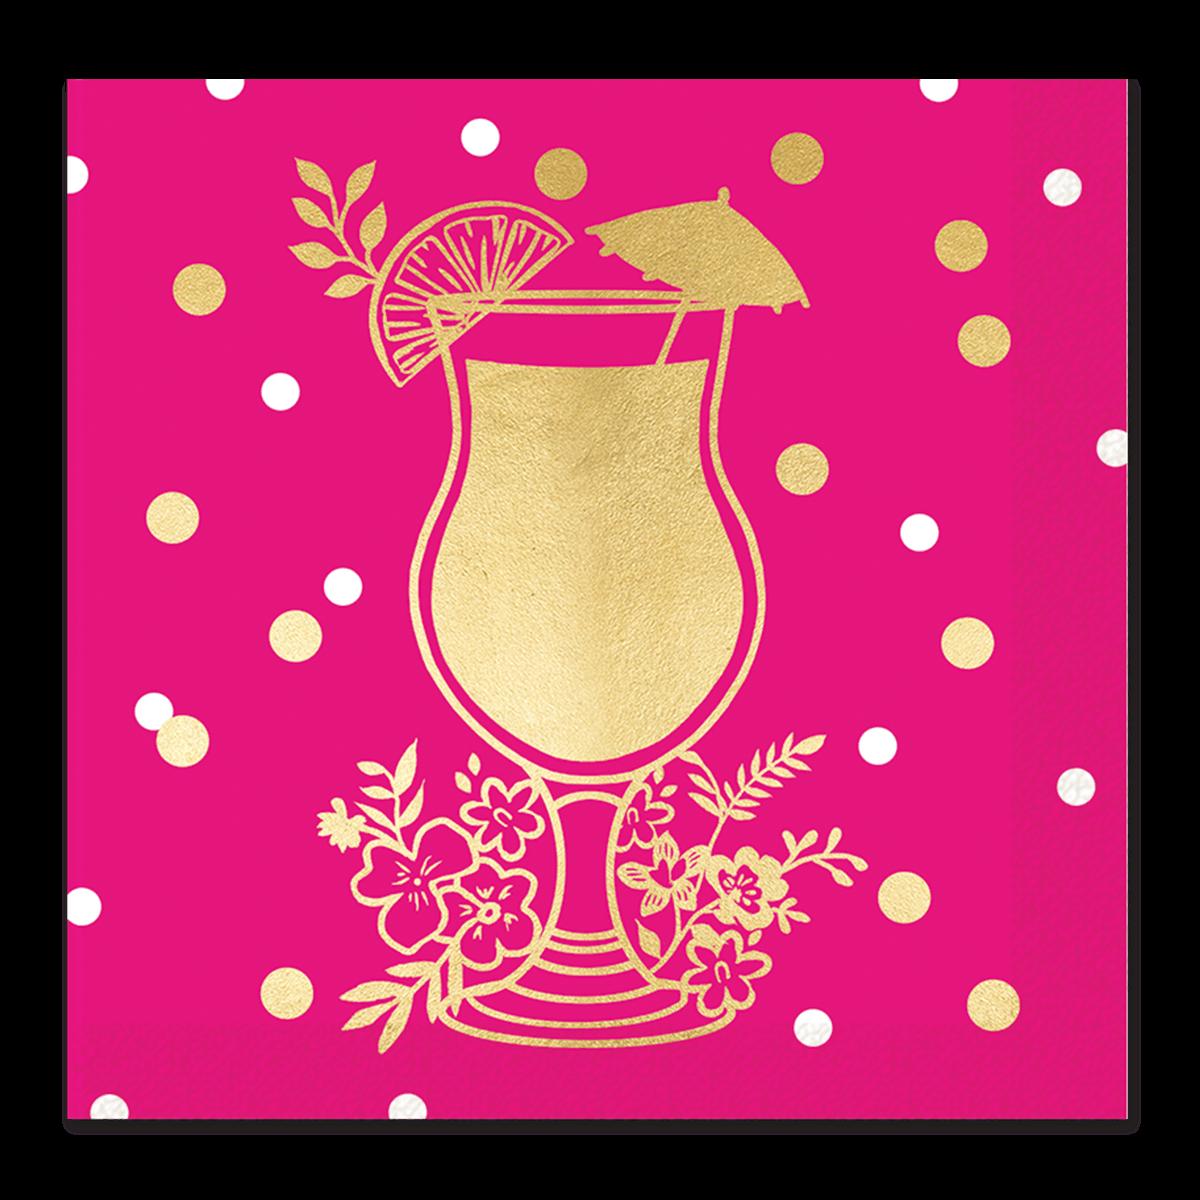 Napkin clipart pink. Hot drink foil lady